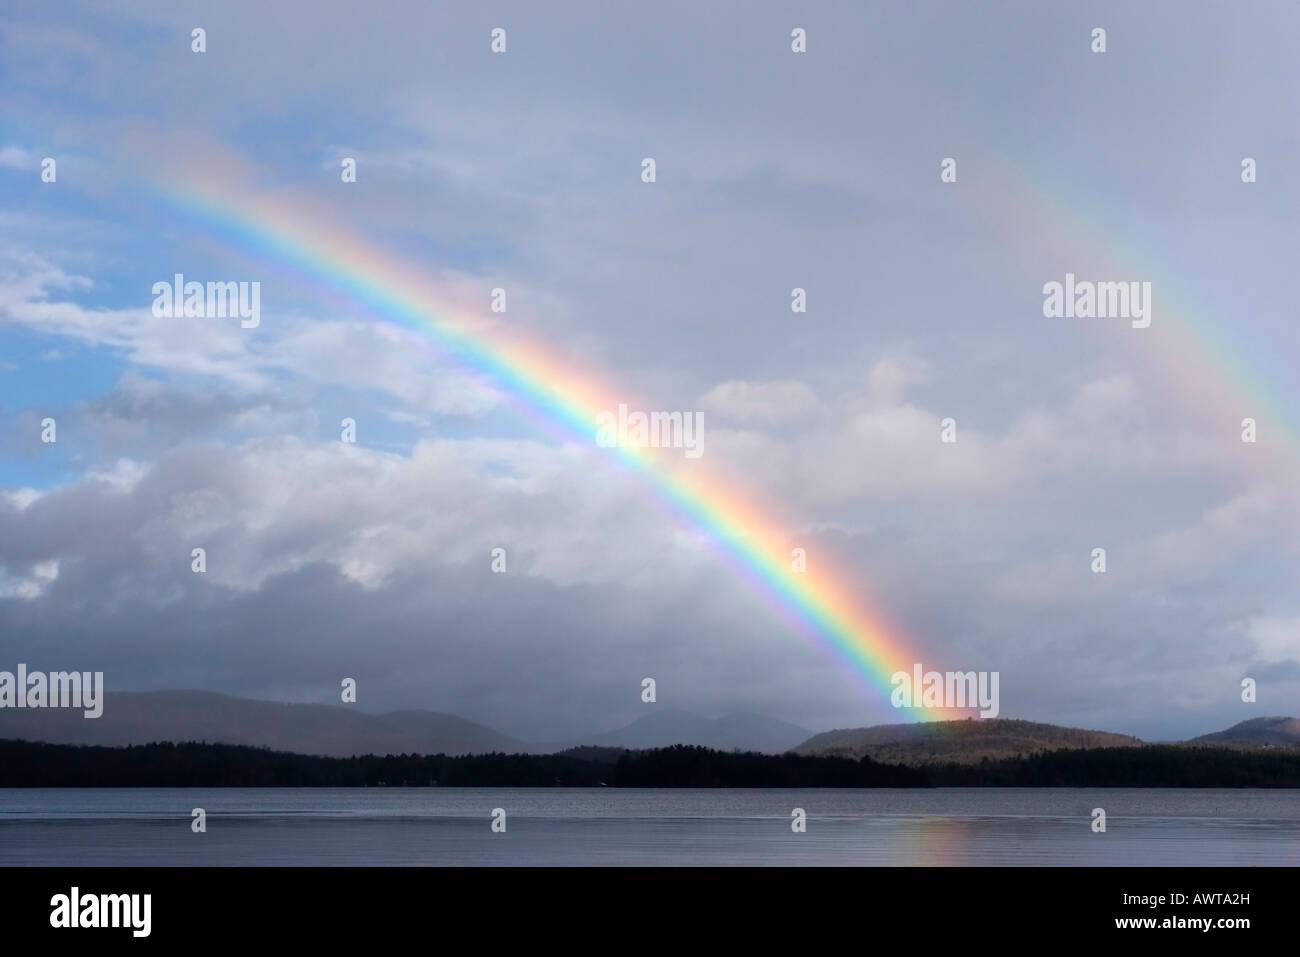 Rainbow over Lake Sacandaga, Adirondack Mountains, New York - Stock Image